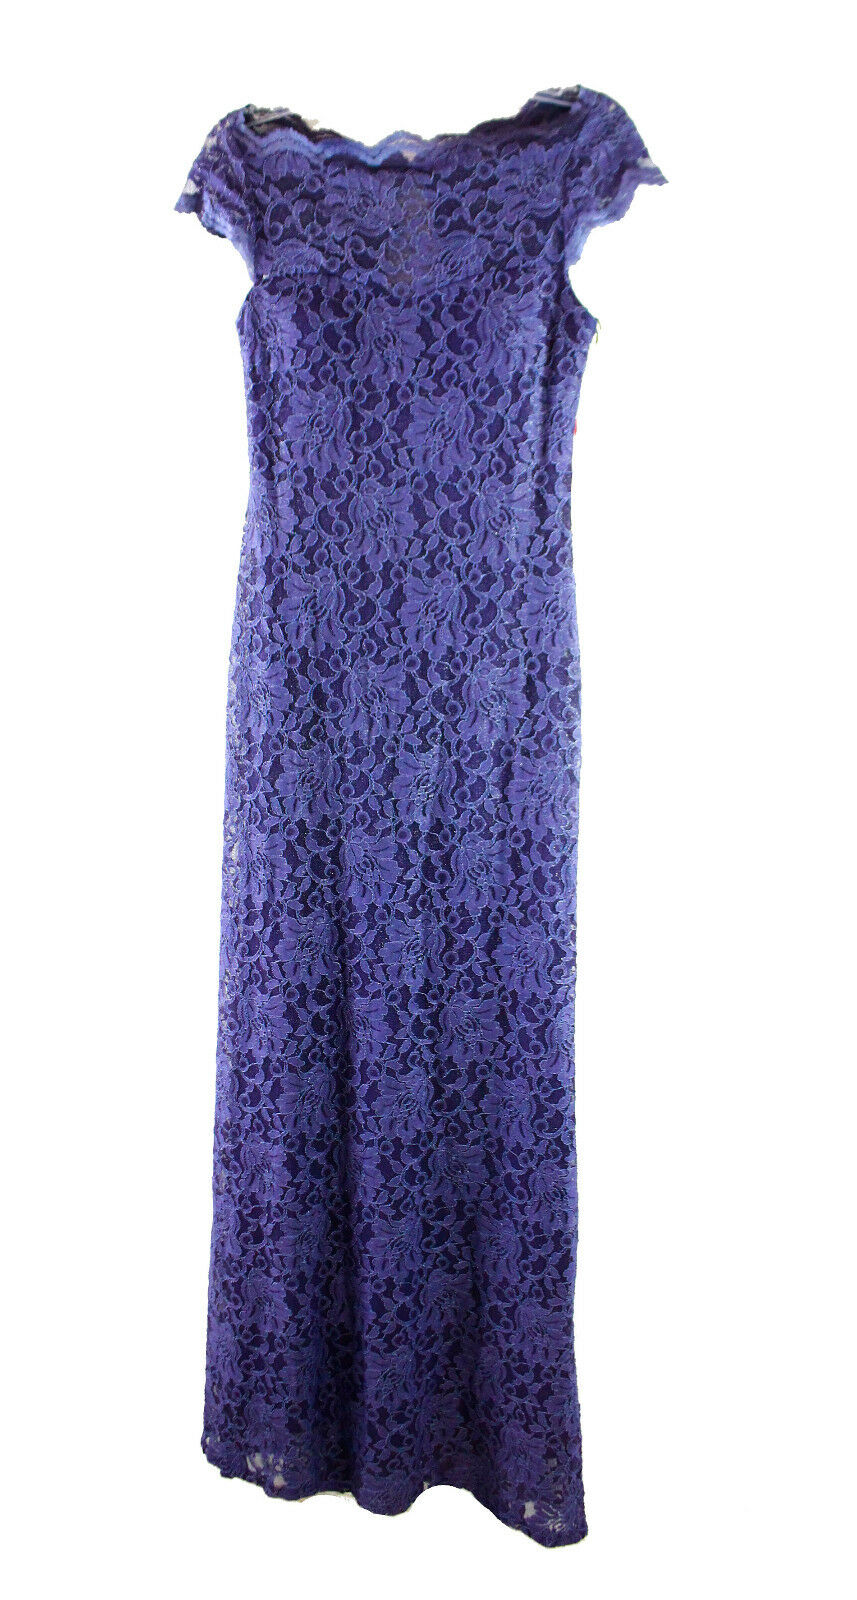 Nightway Woherren Größe 10 lila Steel Illusion Lace Sheath Gown 2277-3